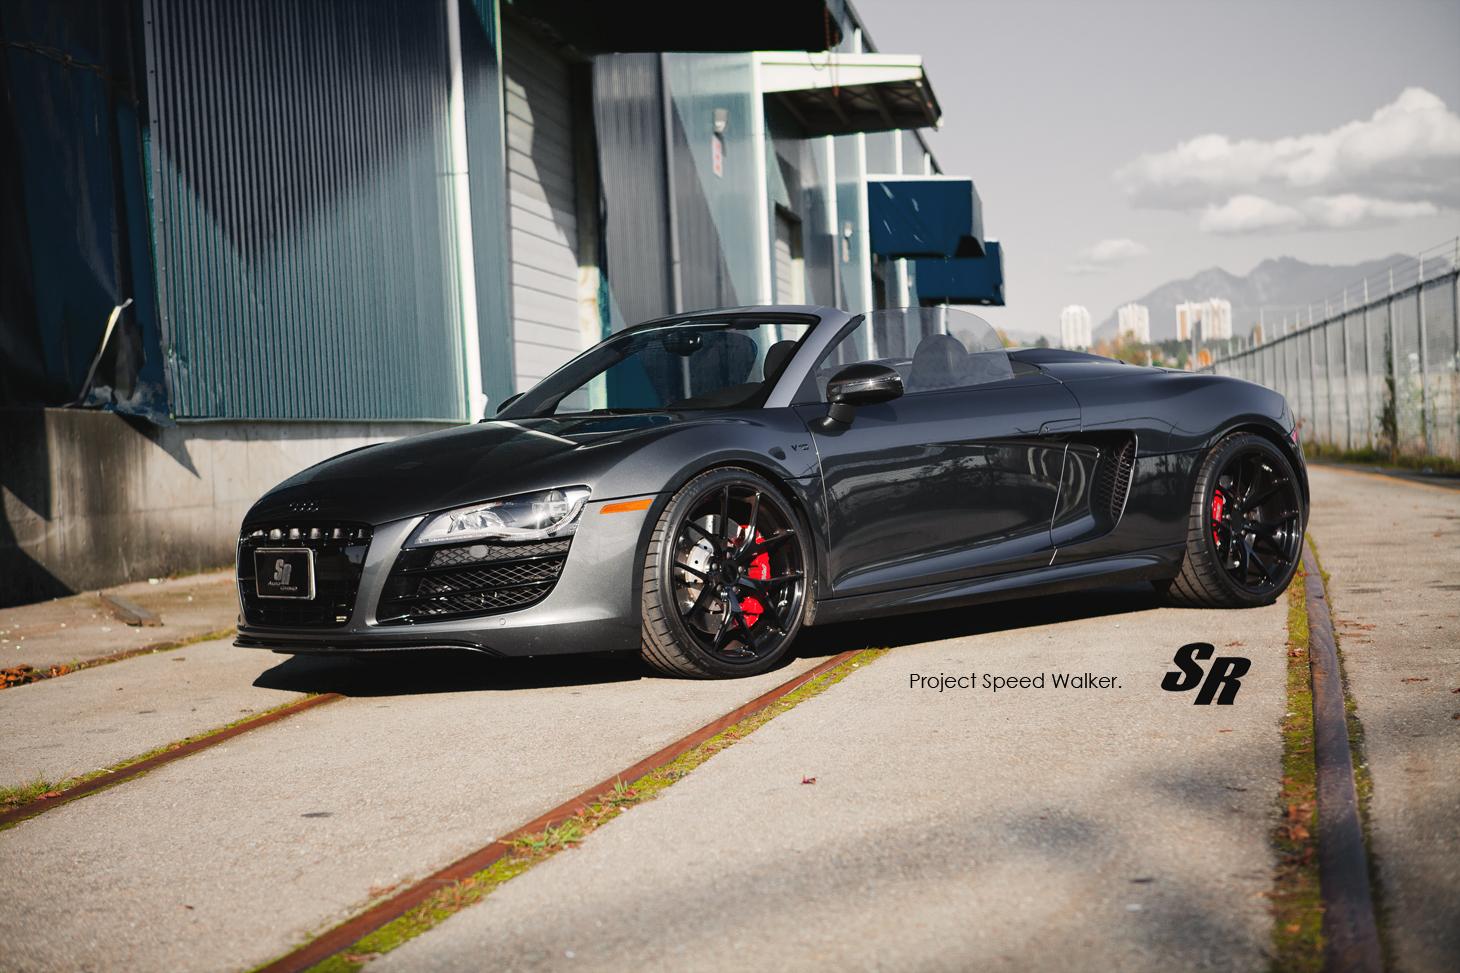 Audi R8 For Sale >> Project Speed Walker: SR Auto Audi R8 Spyder